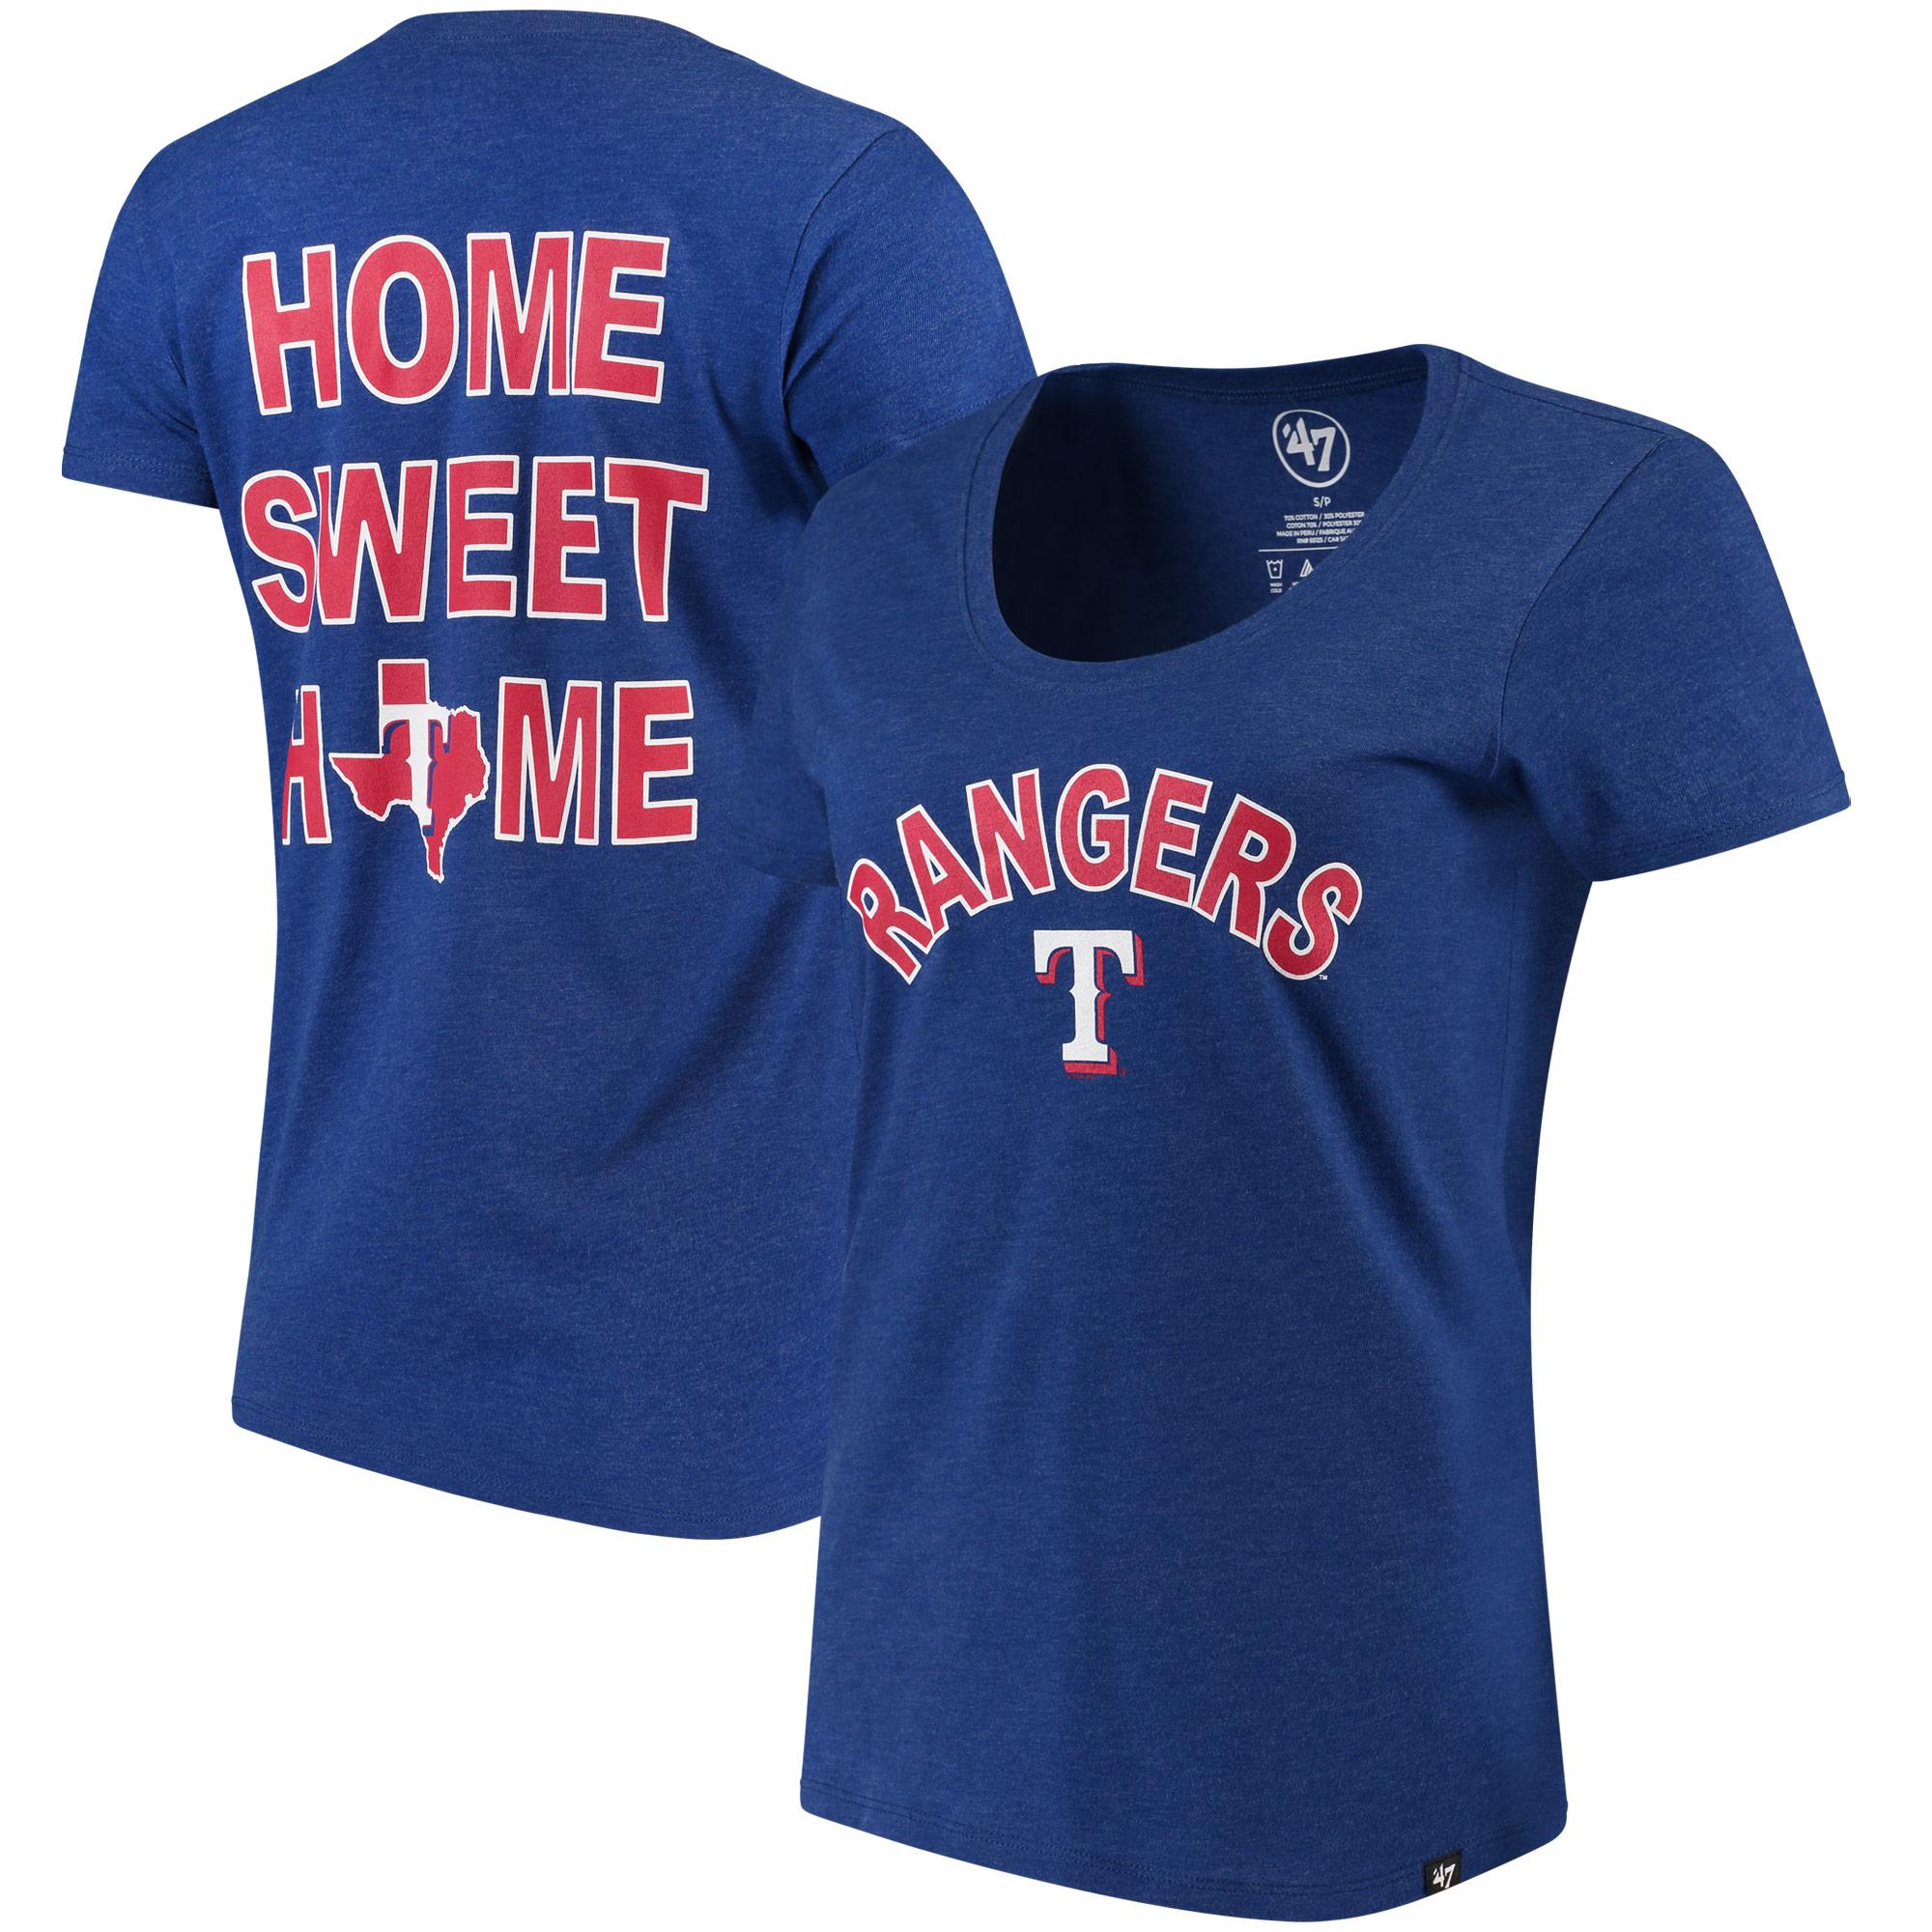 Texas Rangers '47 Women's Club Scoop Neck T-Shirt - Royal